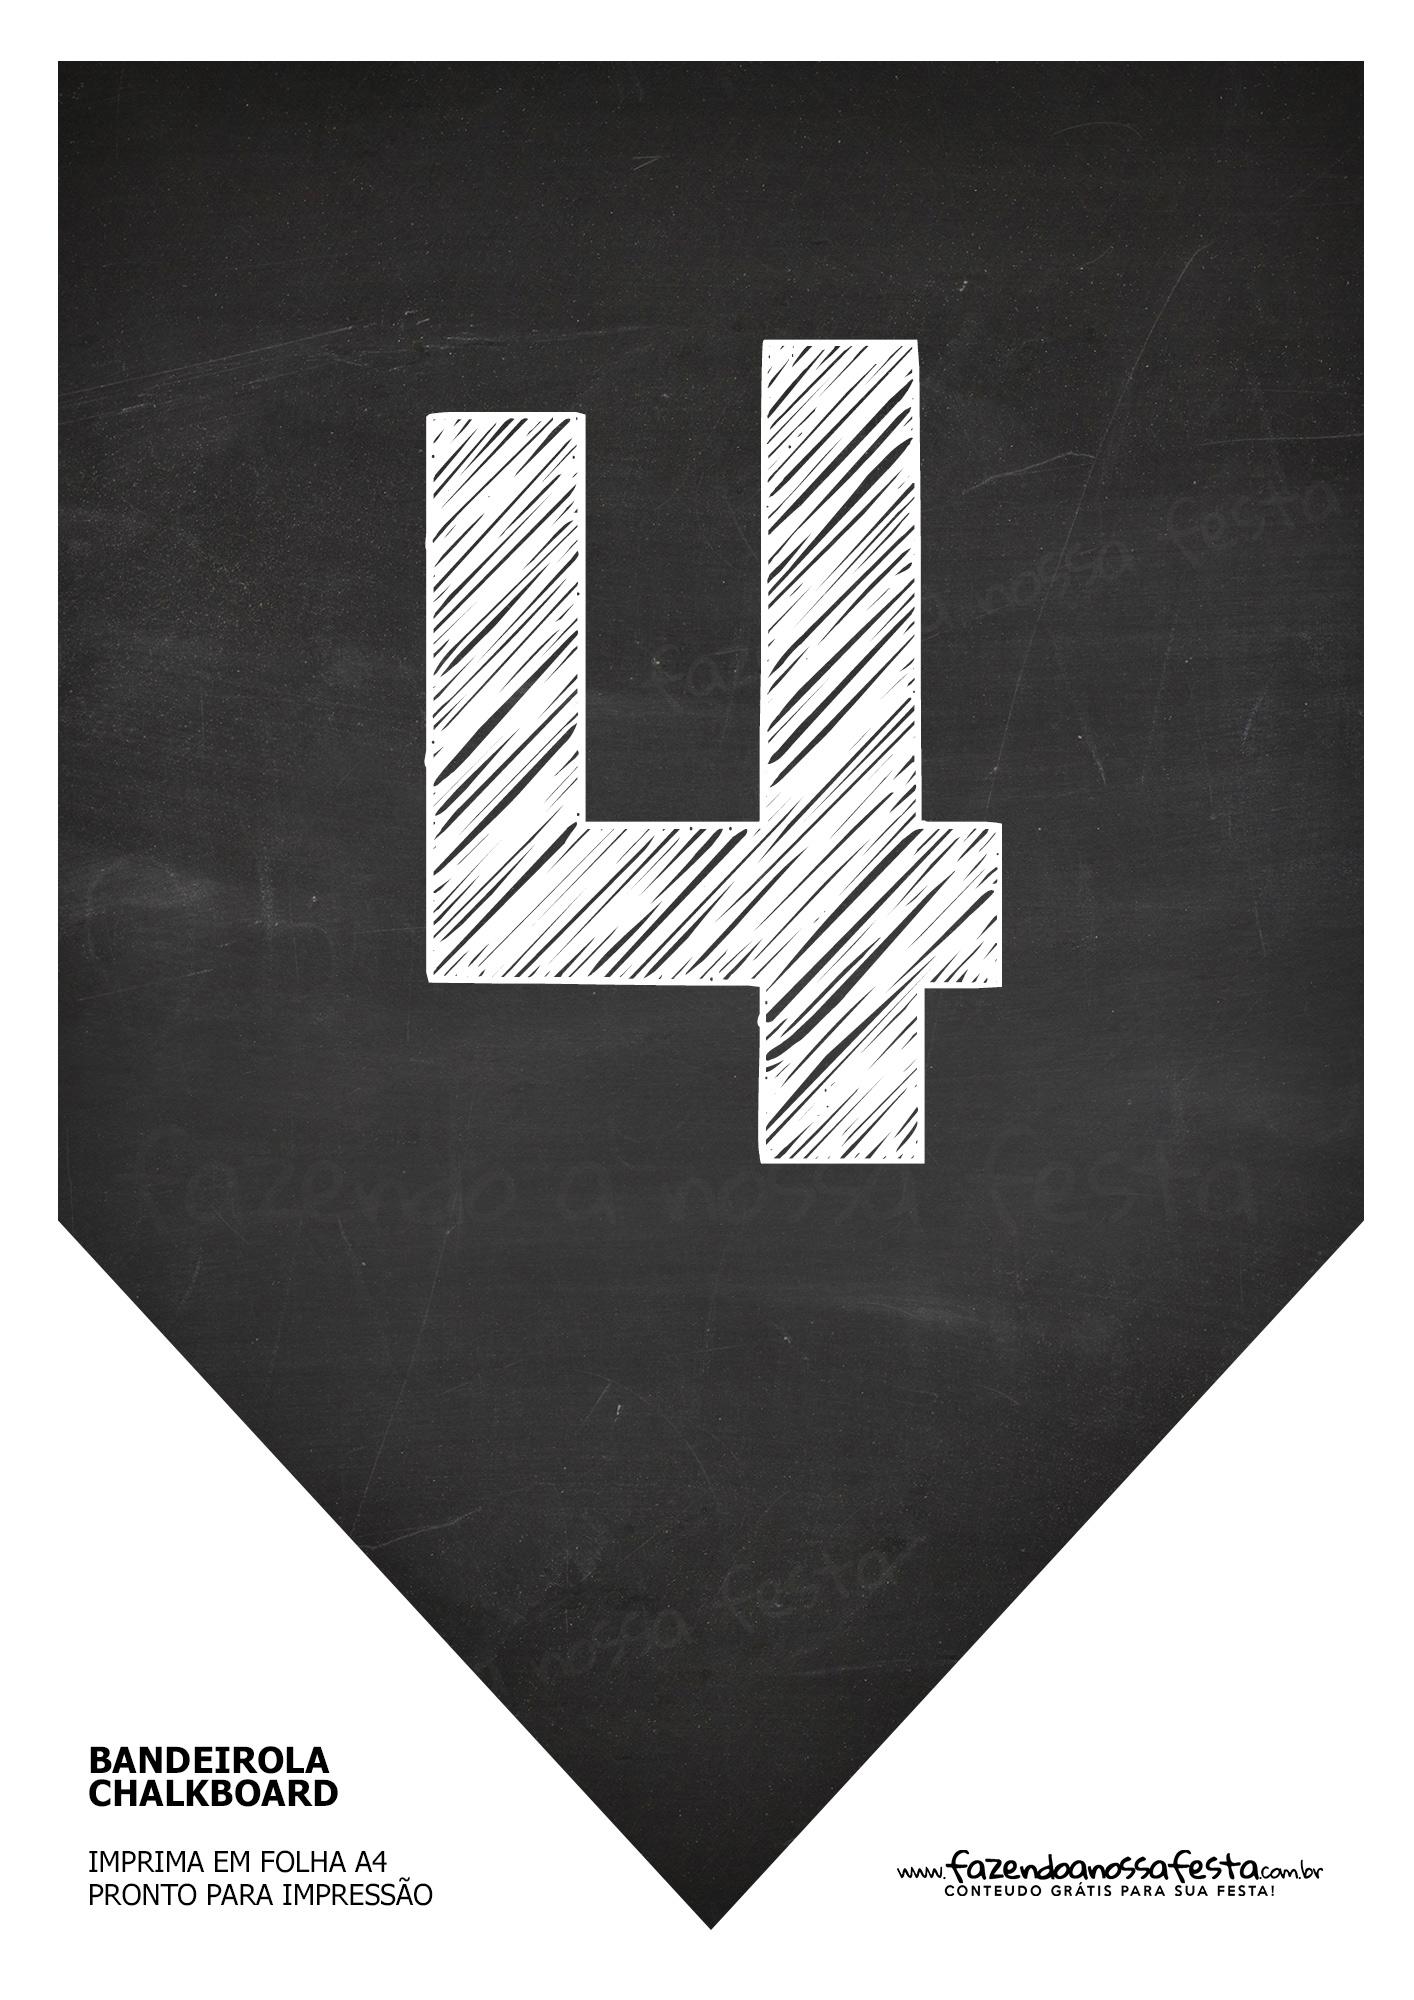 Bandeirinha Chalkboard 4